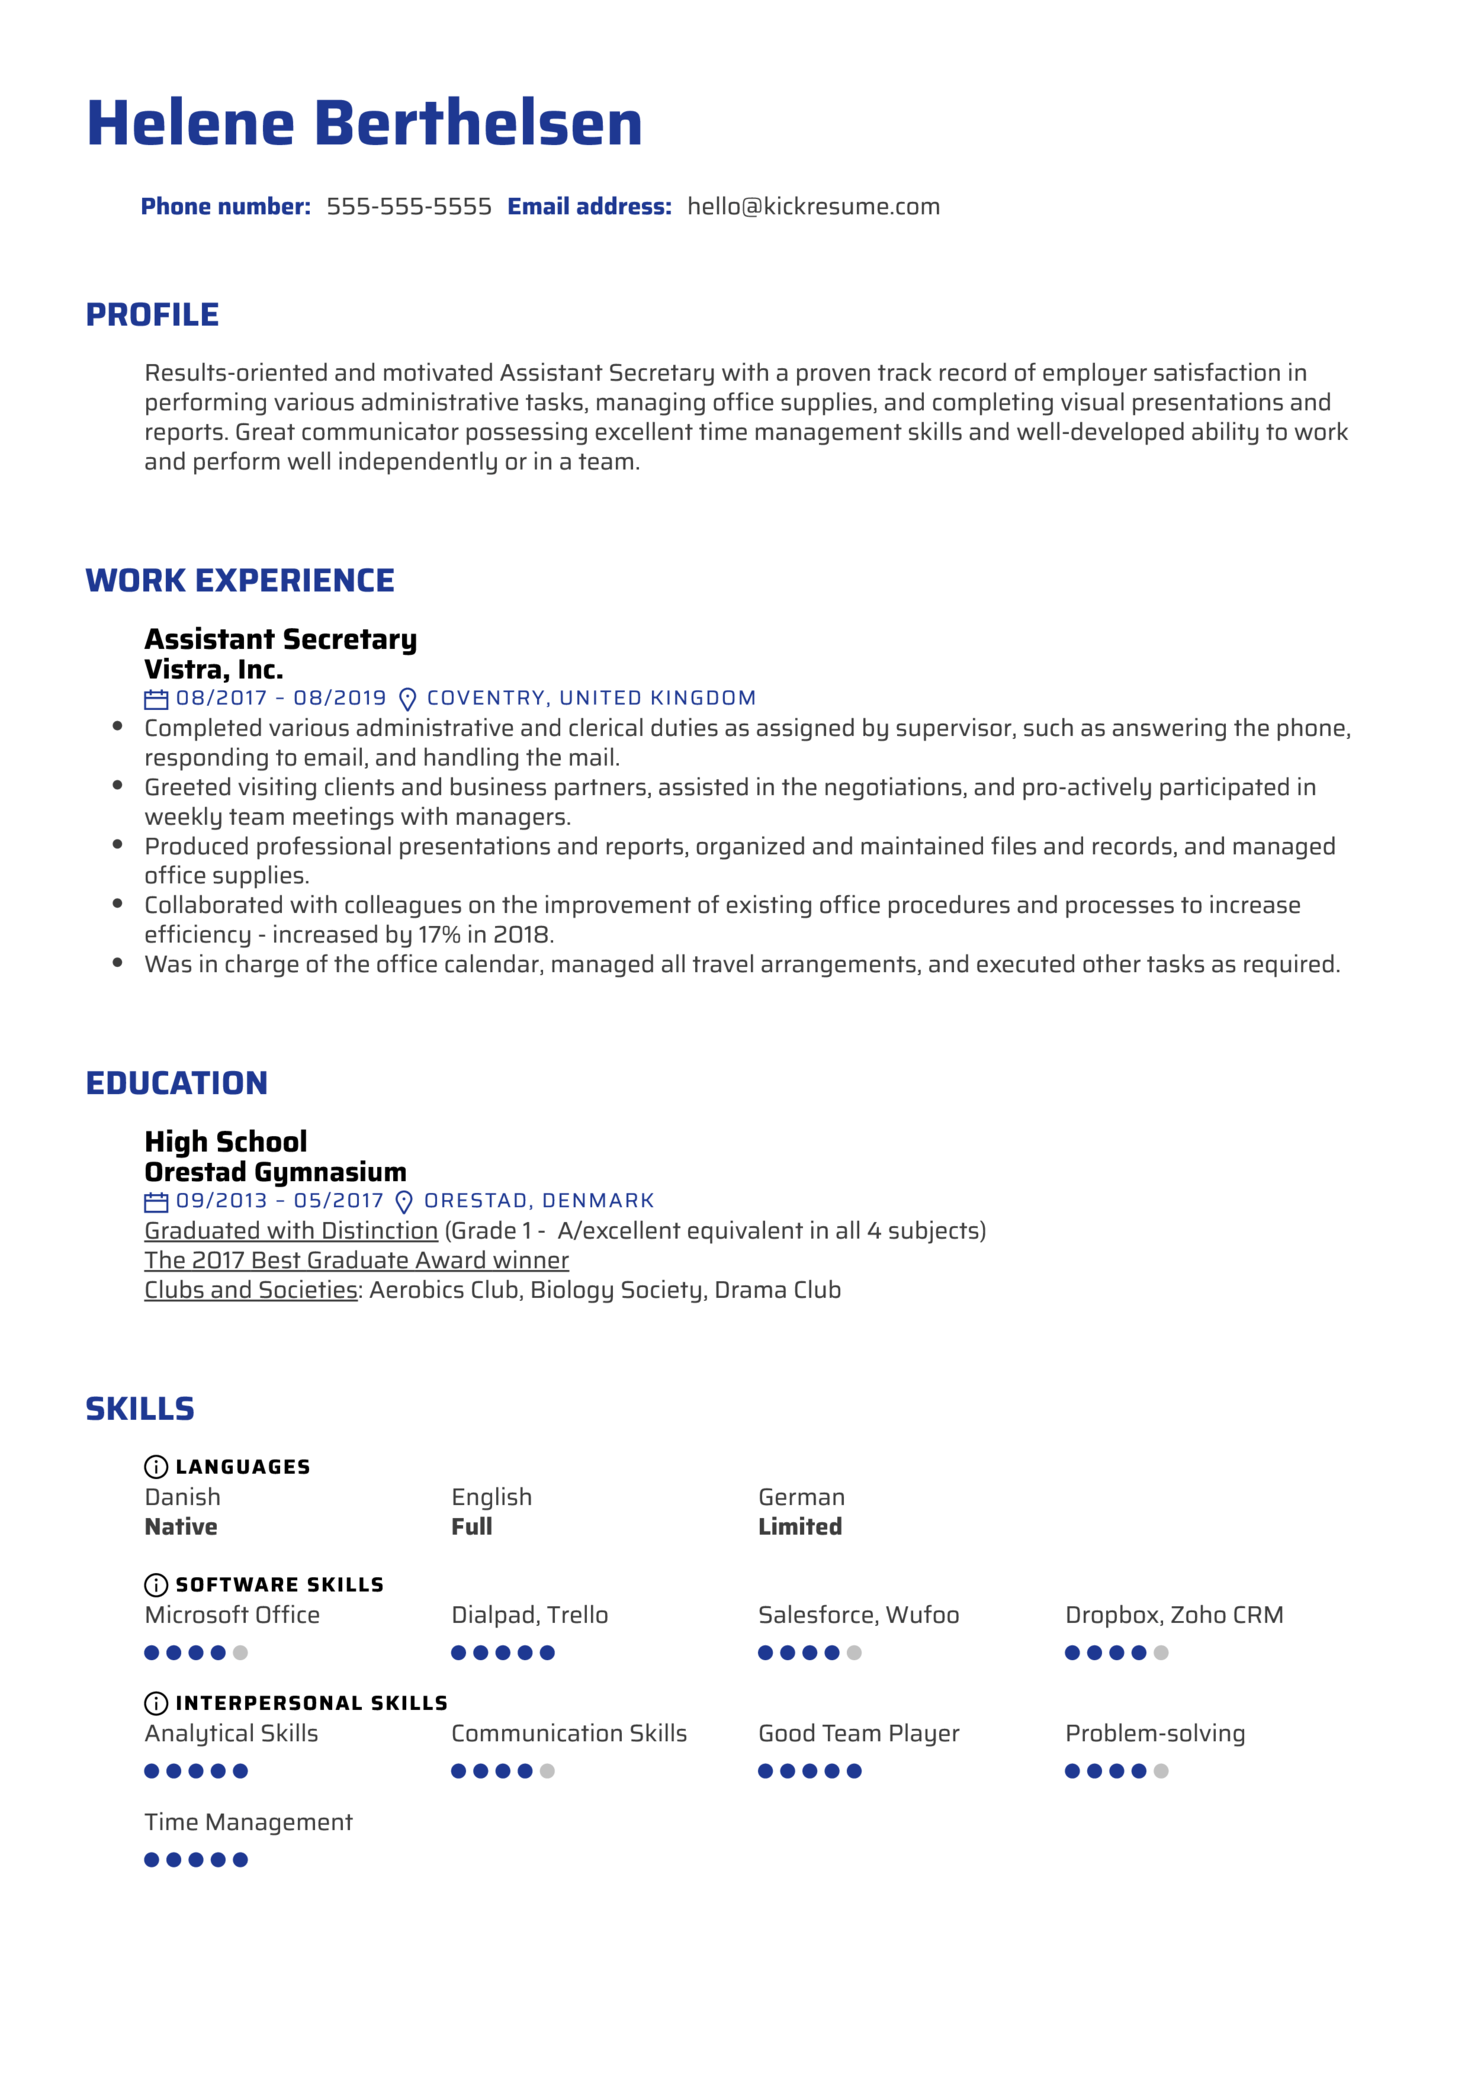 Assistant Secretary Resume Sample (Part 1)